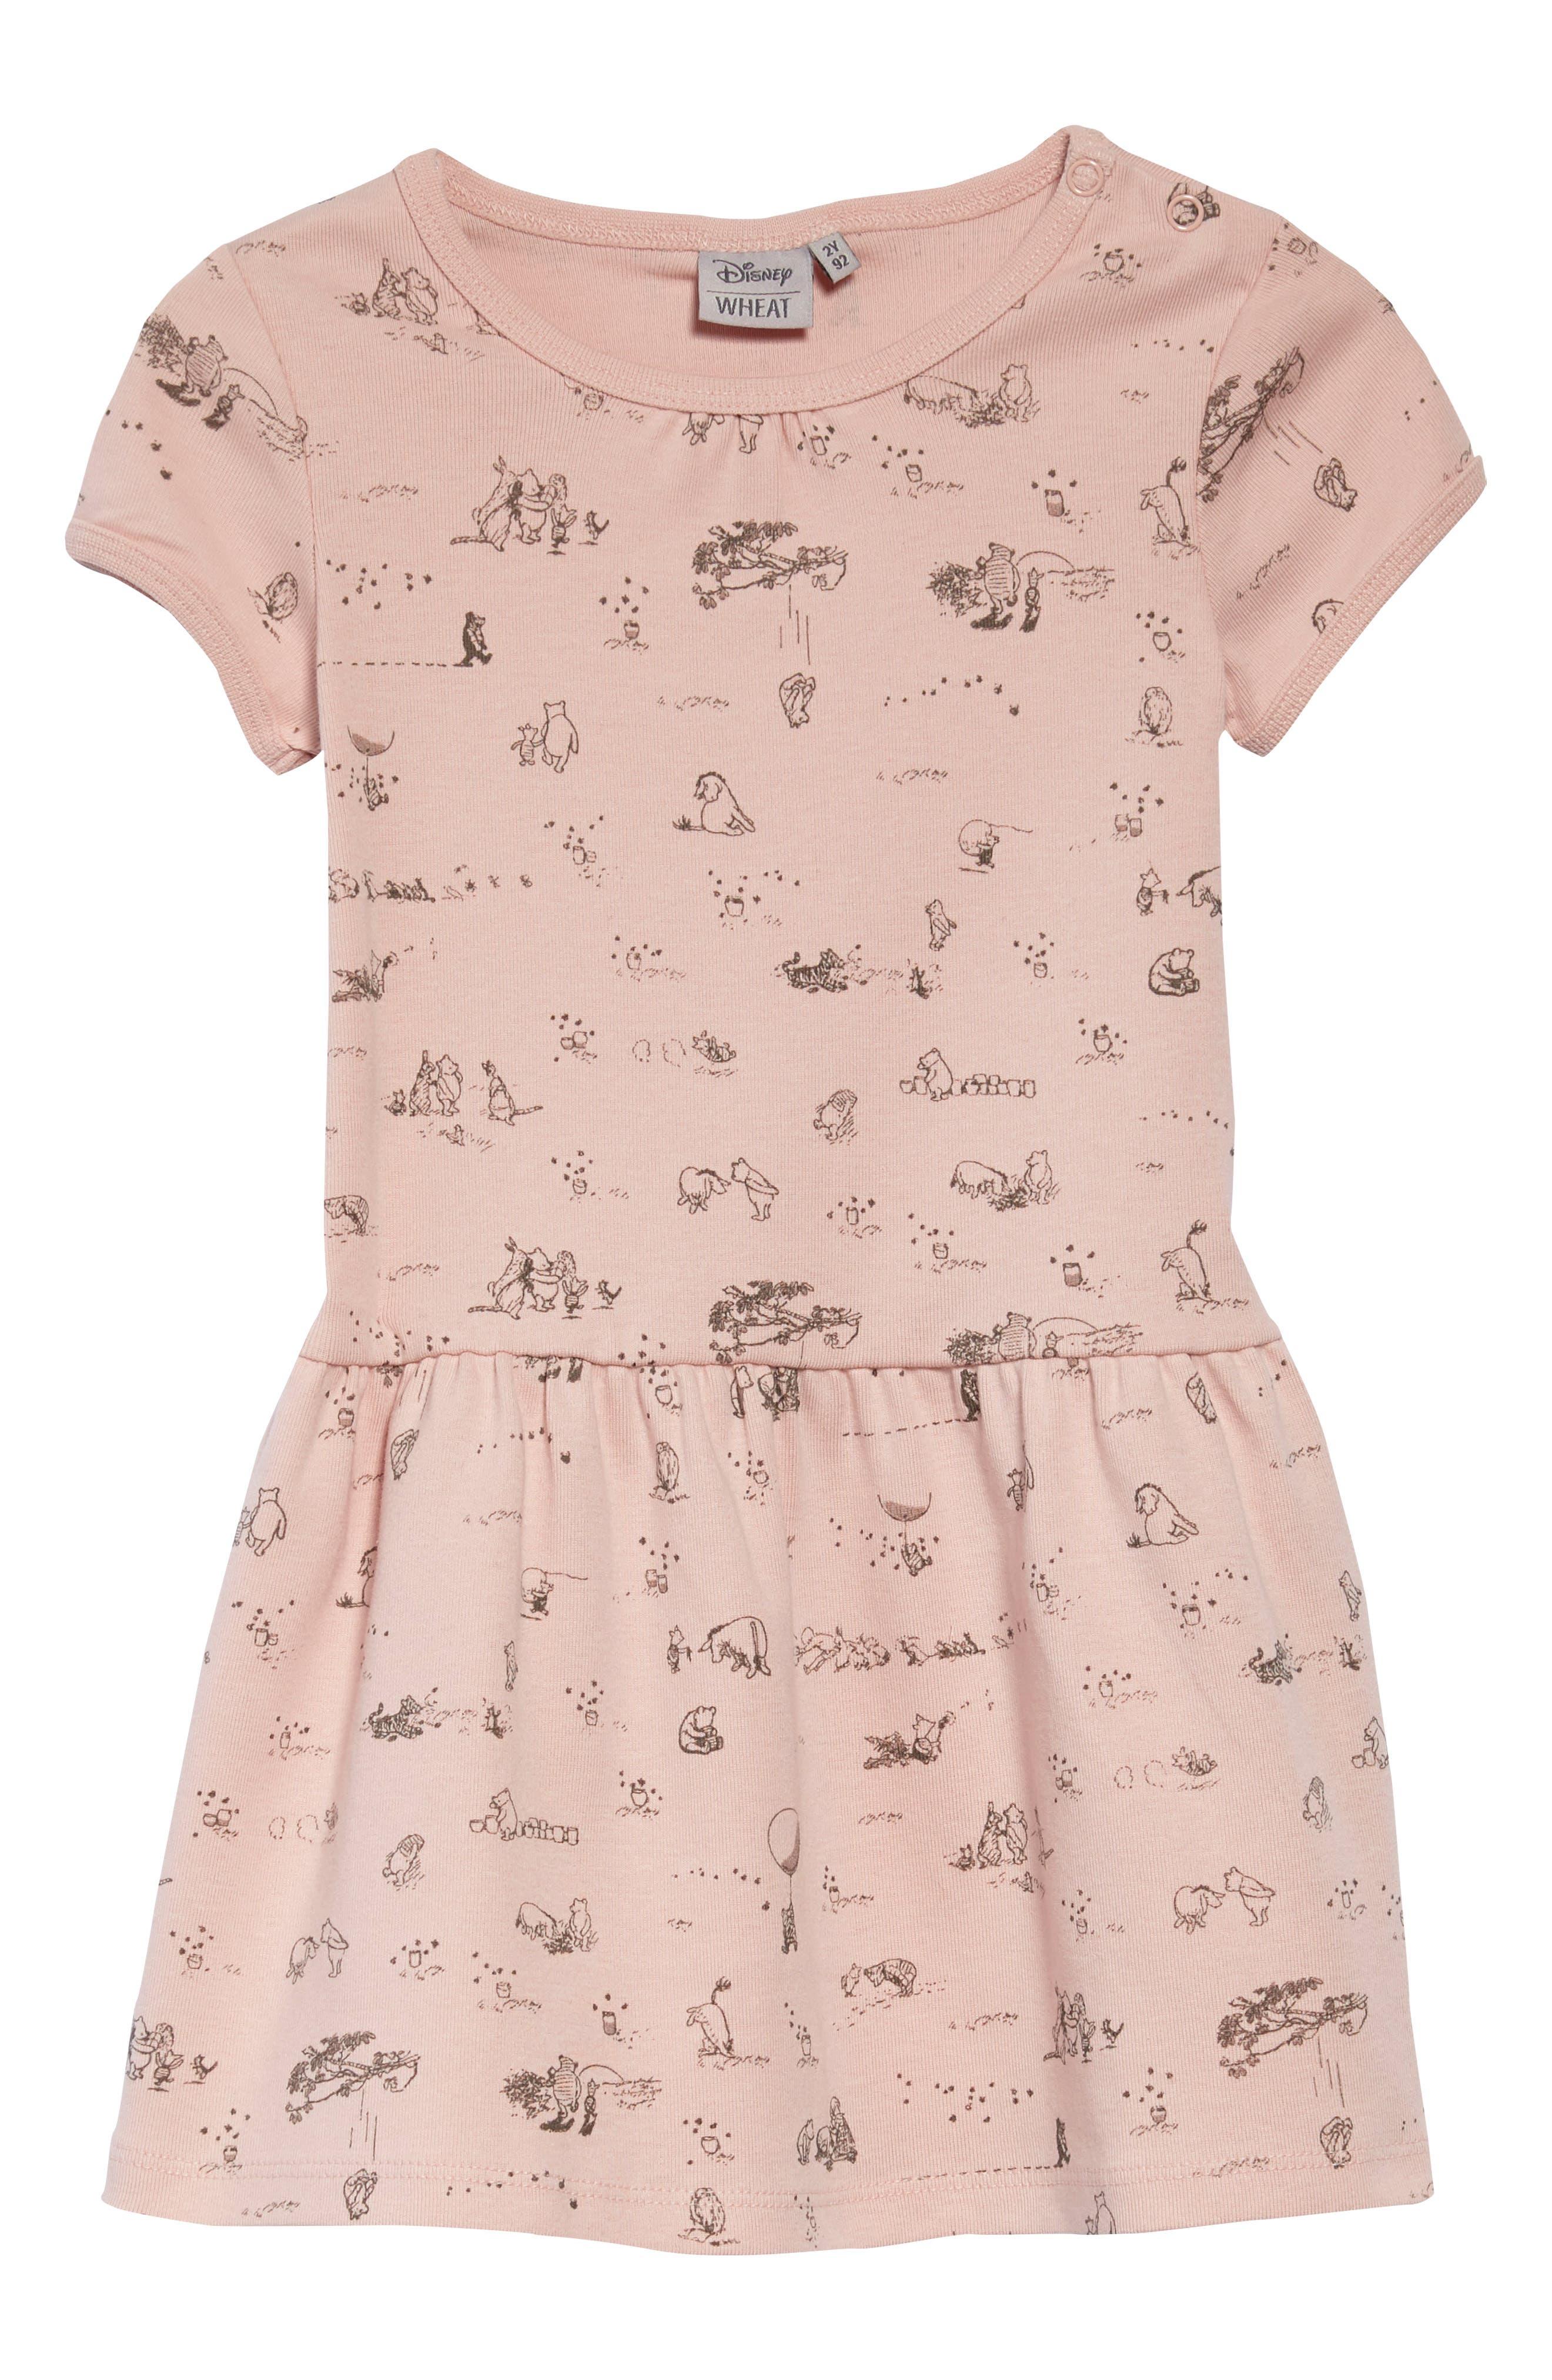 x Disney<sup>®</sup> Winnie the Pooh Print Dress,                             Main thumbnail 1, color,                             651